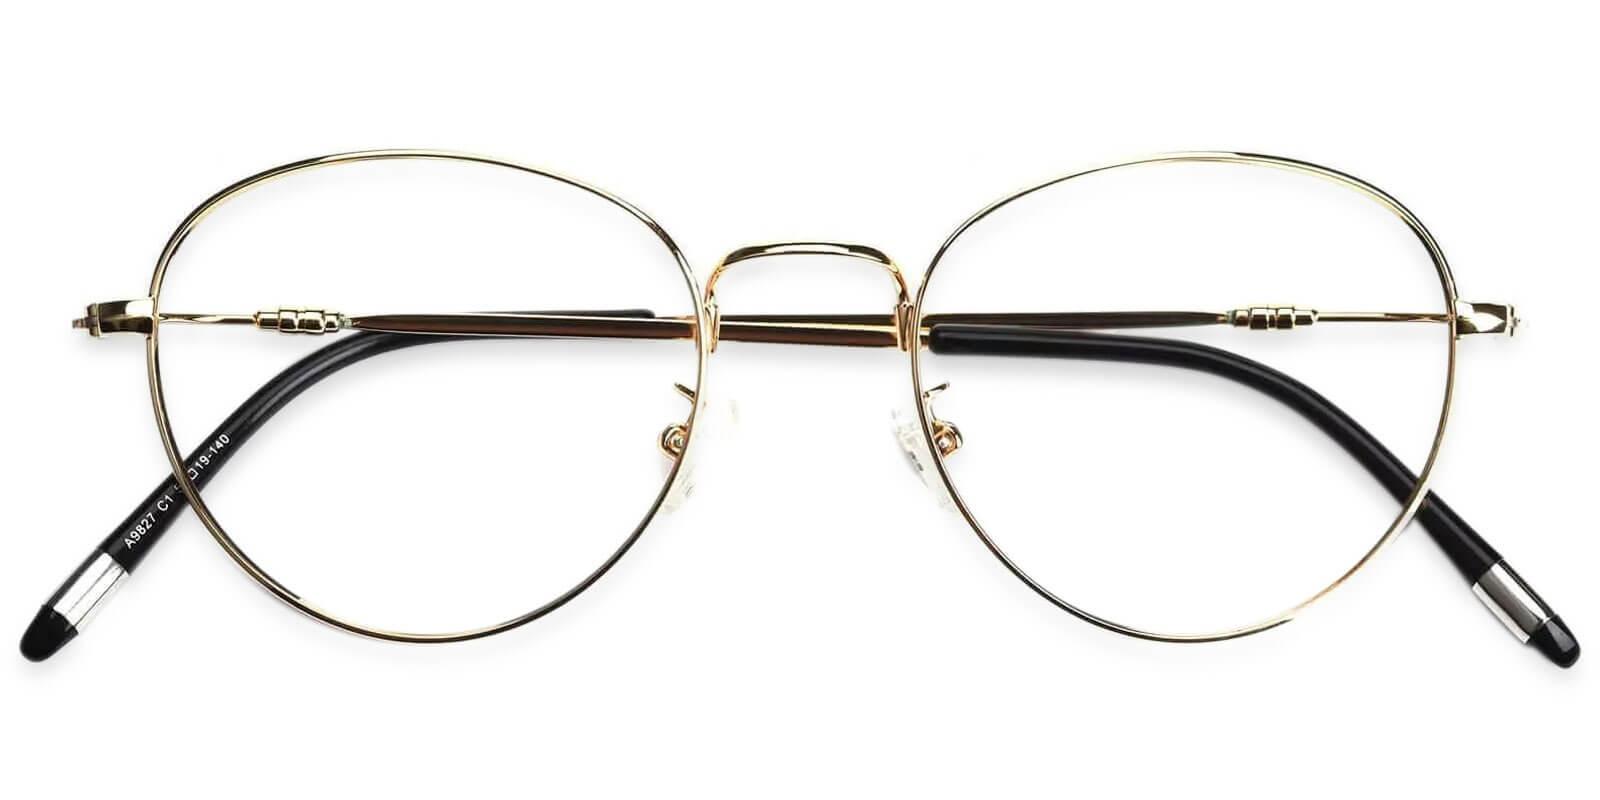 Madison Gold Metal Eyeglasses , Lightweight , NosePads Frames from ABBE Glasses